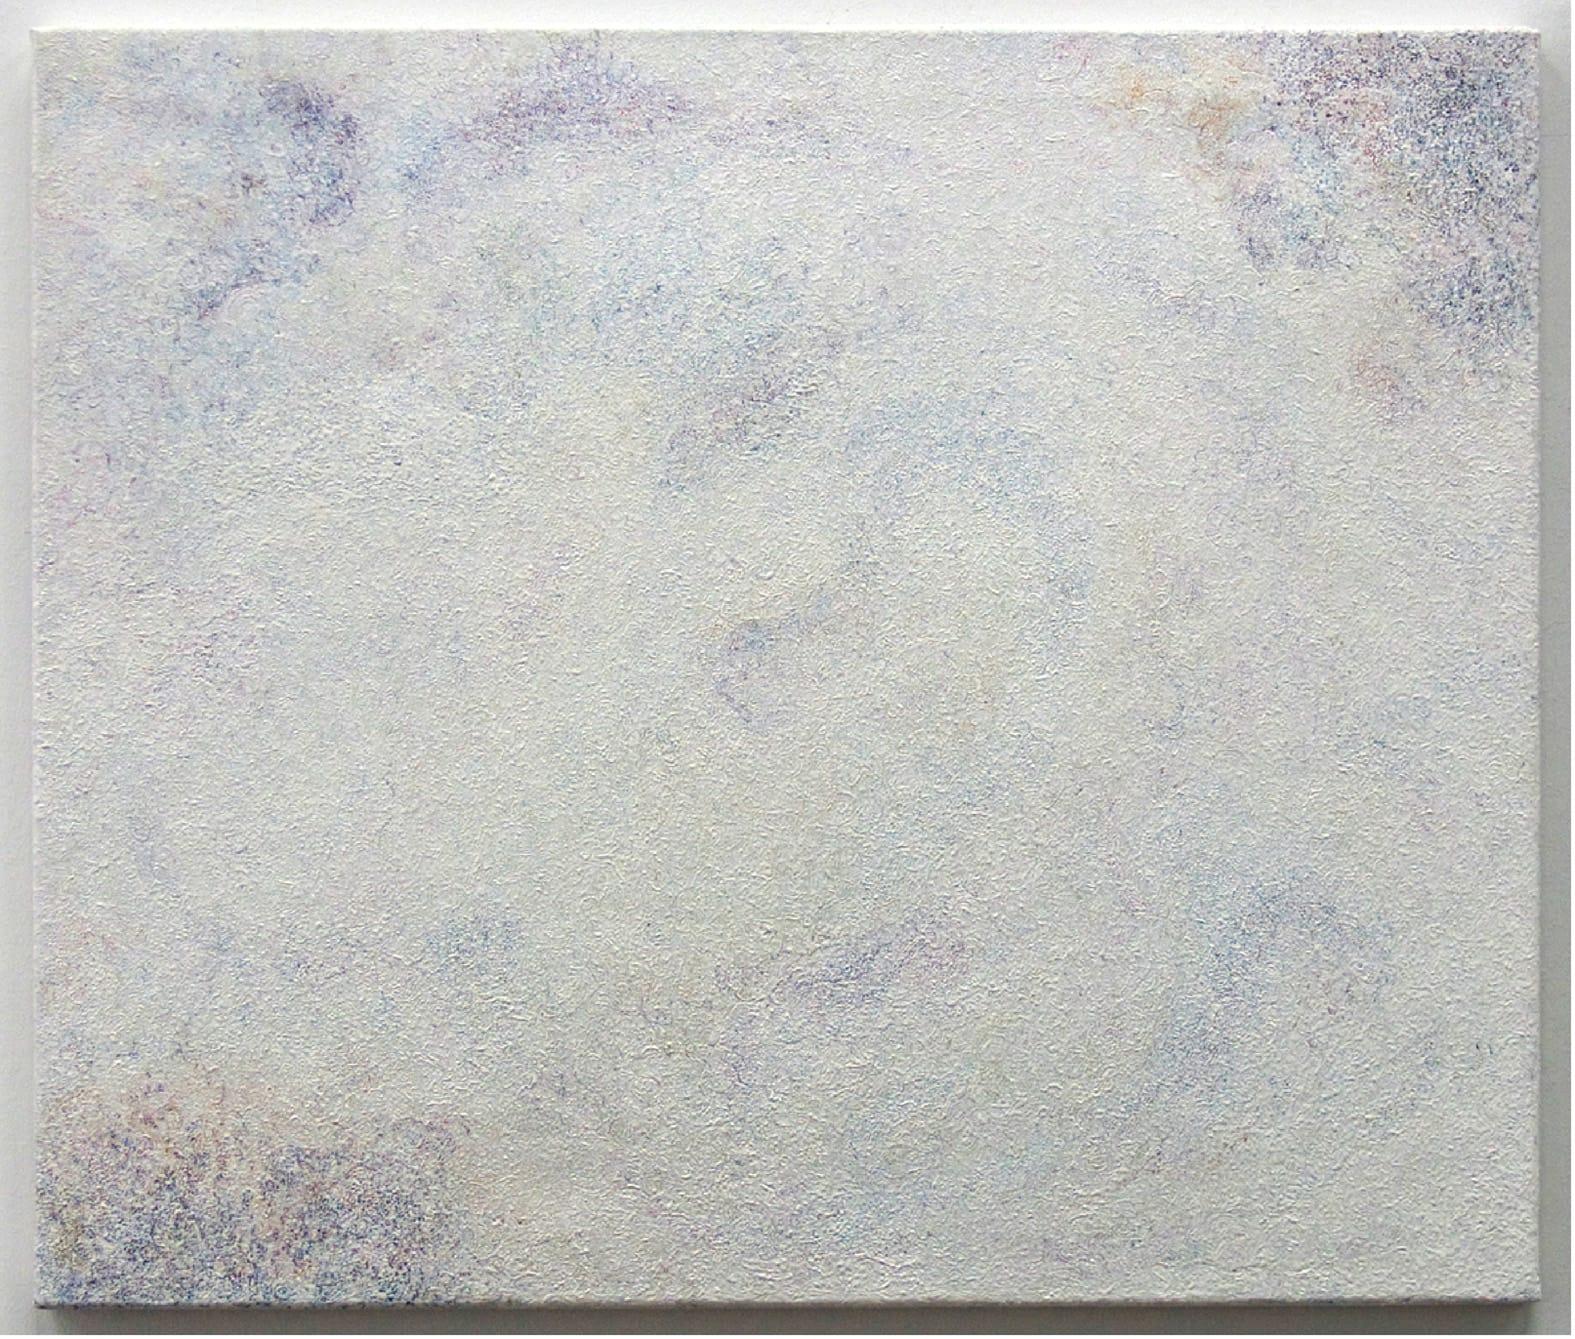 "<span class=""link fancybox-details-link""><a href=""/artists/136-eggert-petursson/works/2206/"">View Detail Page</a></span><div class=""artist""><strong>EGGERT PÉTURSSON</strong></div> <div class=""title""><em>Untitled</em>, 1993</div> <div class=""medium"">oil on canvas</div> <div class=""dimensions"">56 x 66.2 cm</div>"